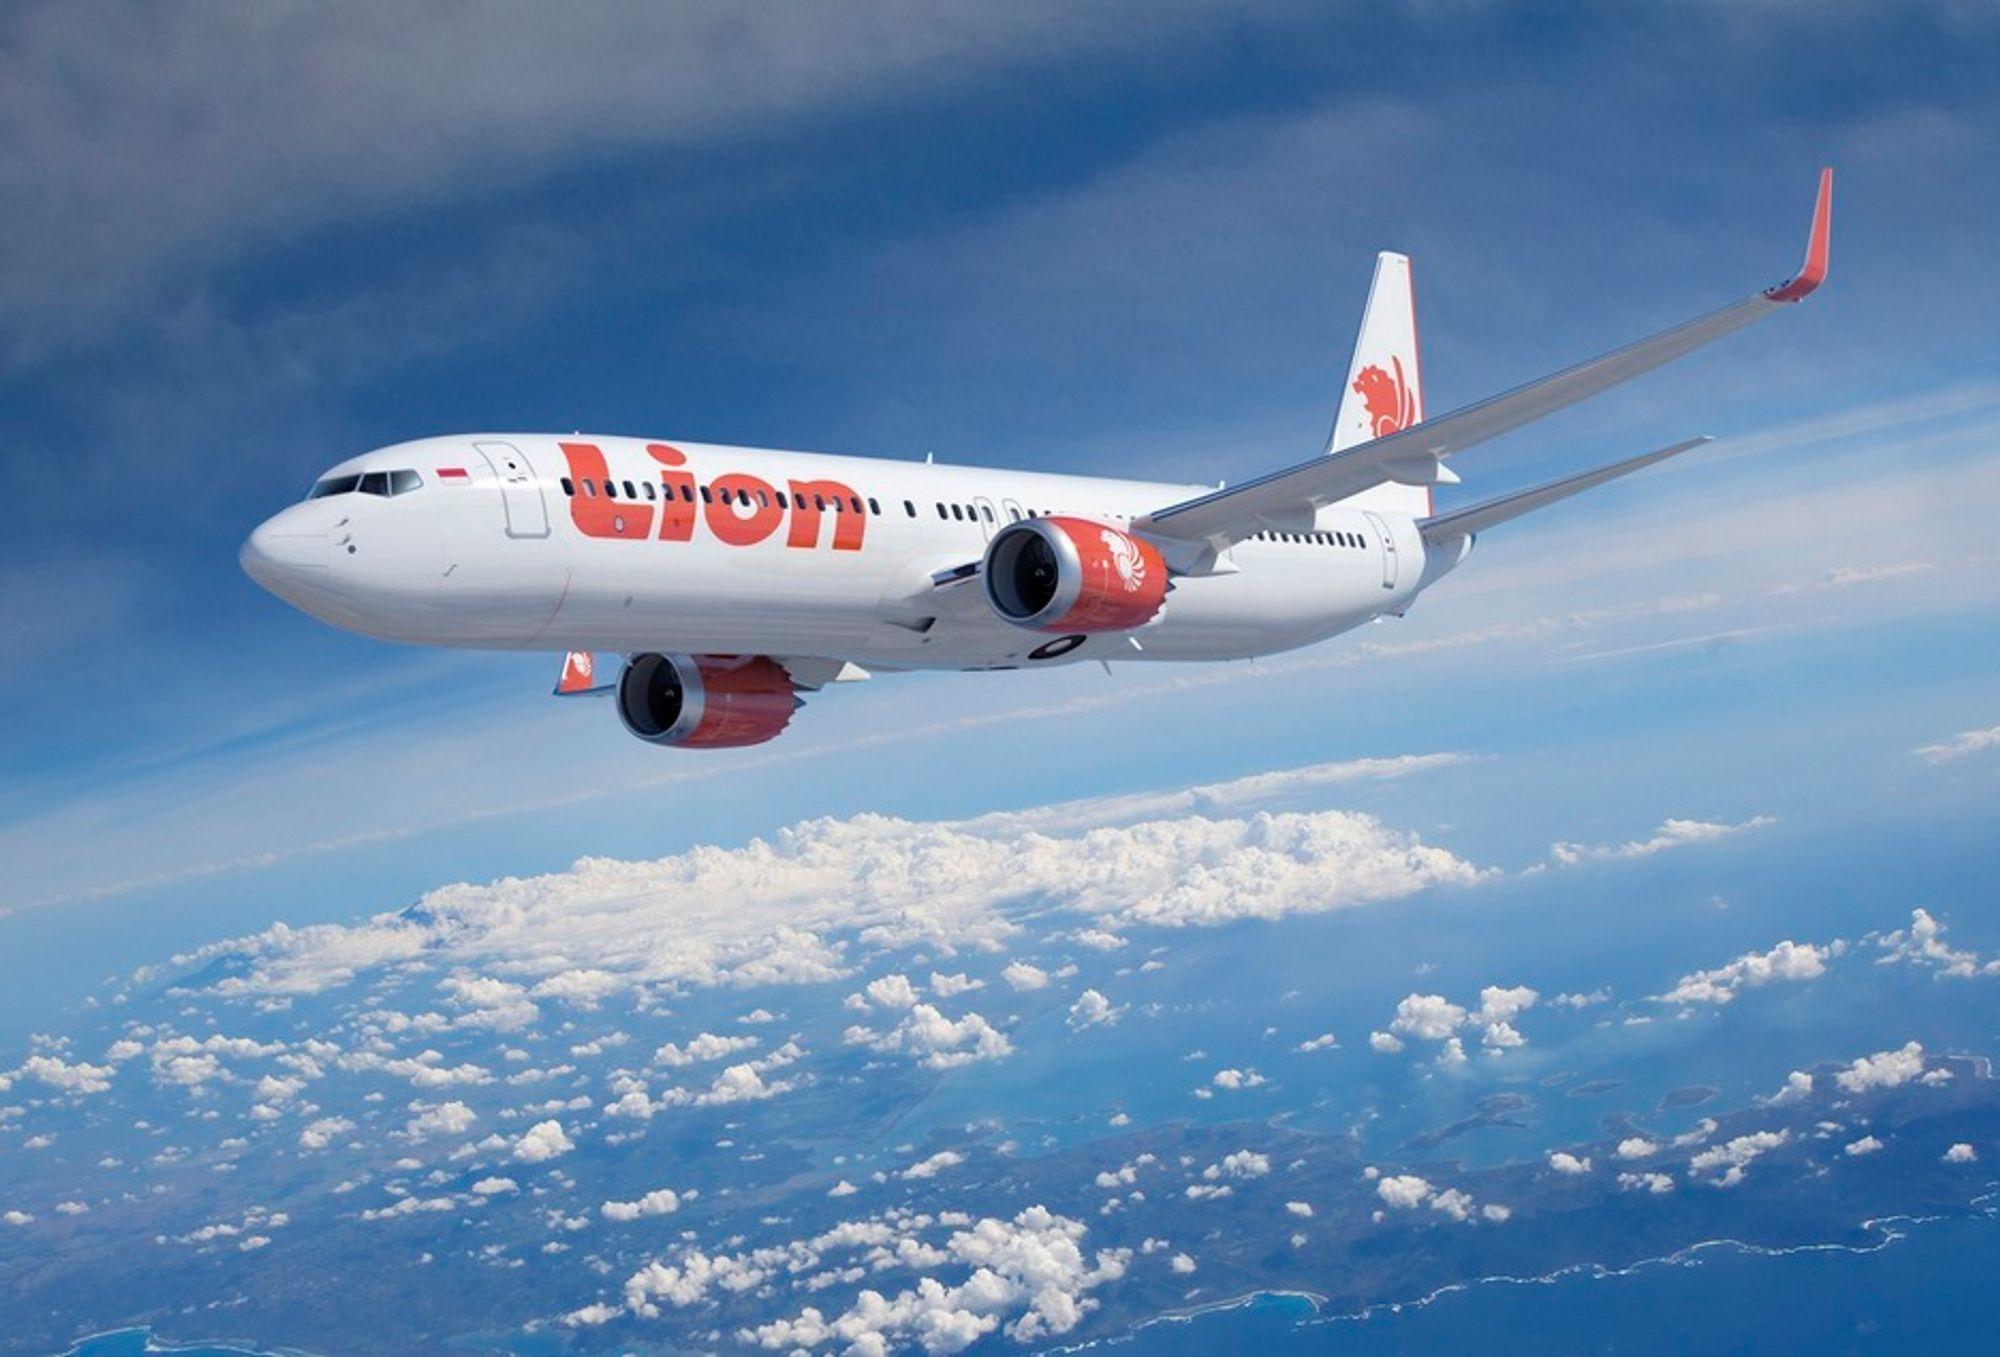 Boeing 737 Max i Lion Airs dekor. Flyselskapet har tilhold i Indonesia, verdens fjerde mest folkerike land.